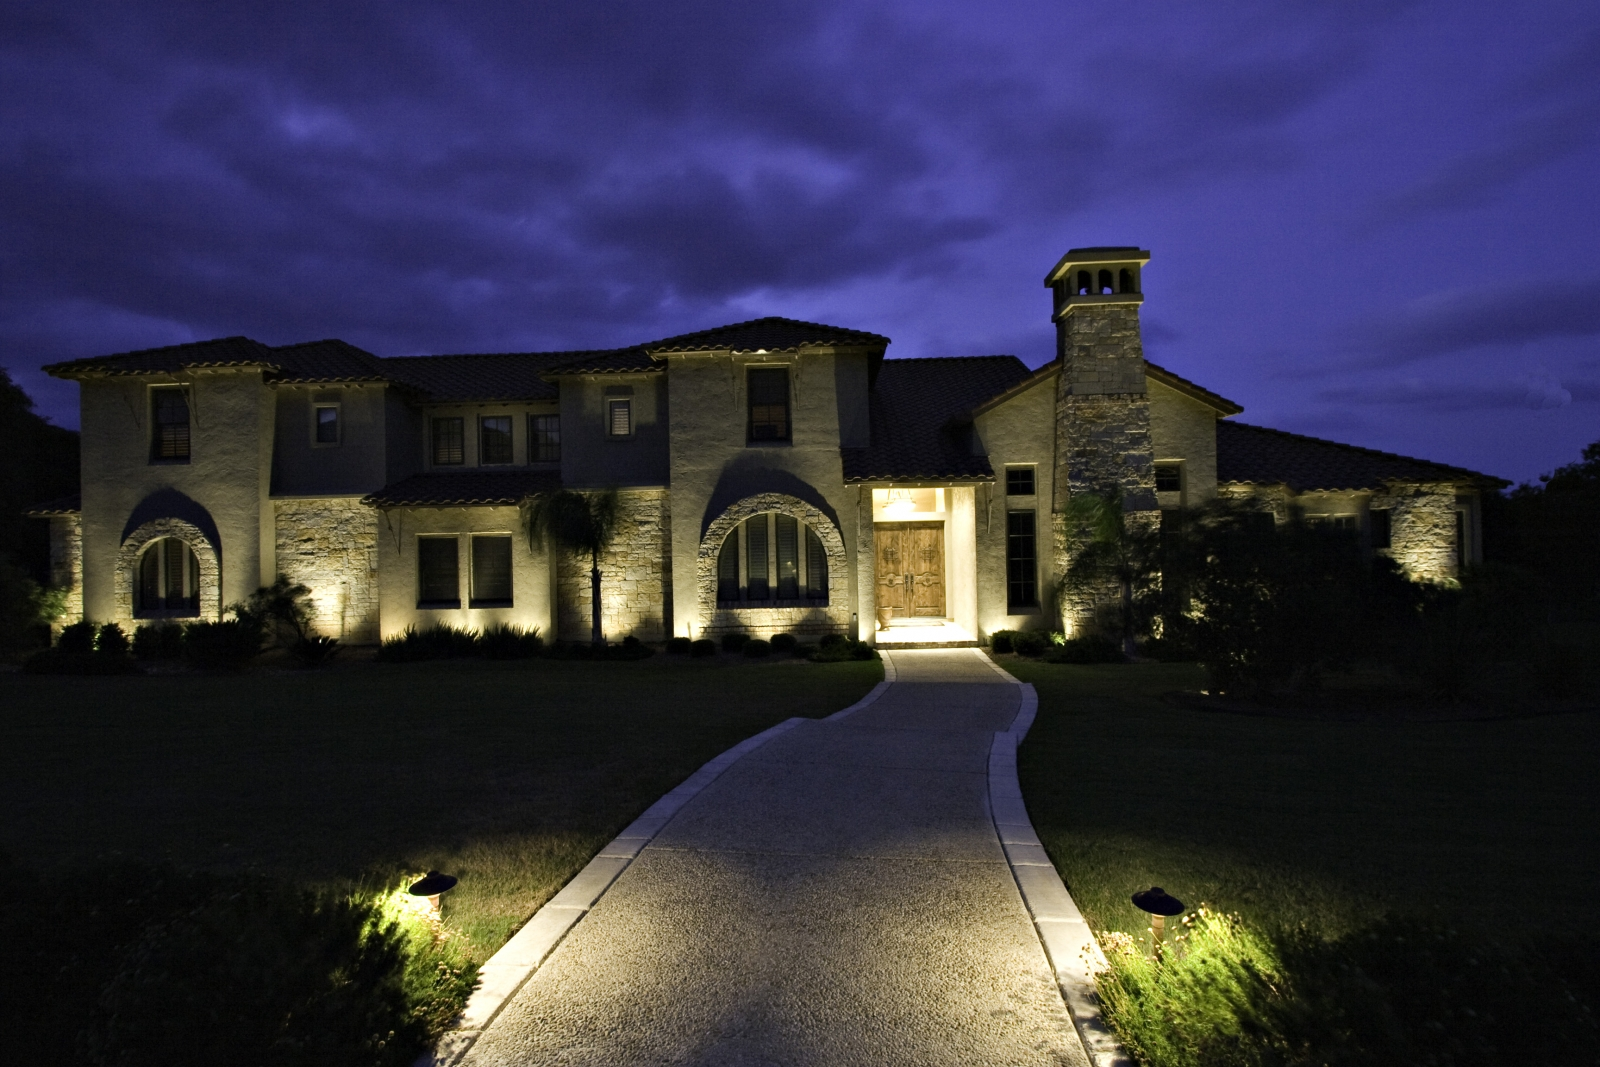 outdoor lighting hacks to set the mood